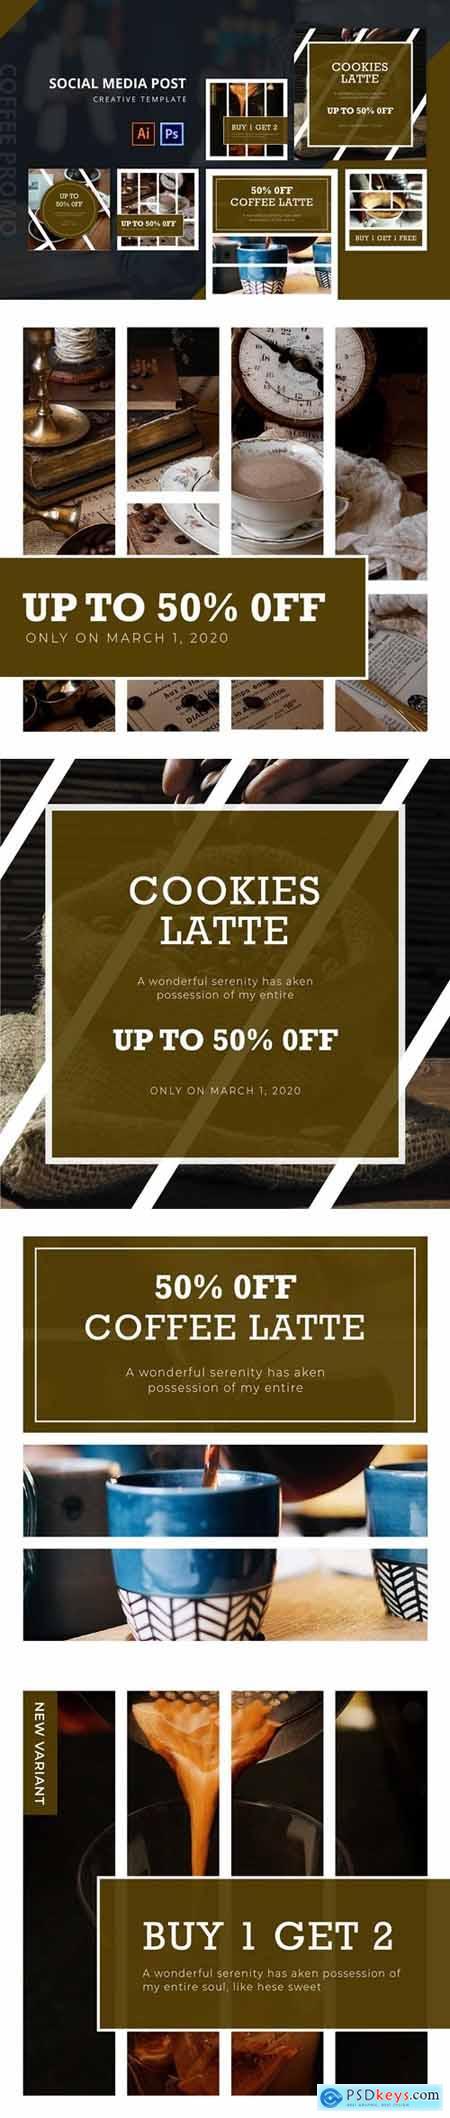 Coffee Promo Social Media Post Template